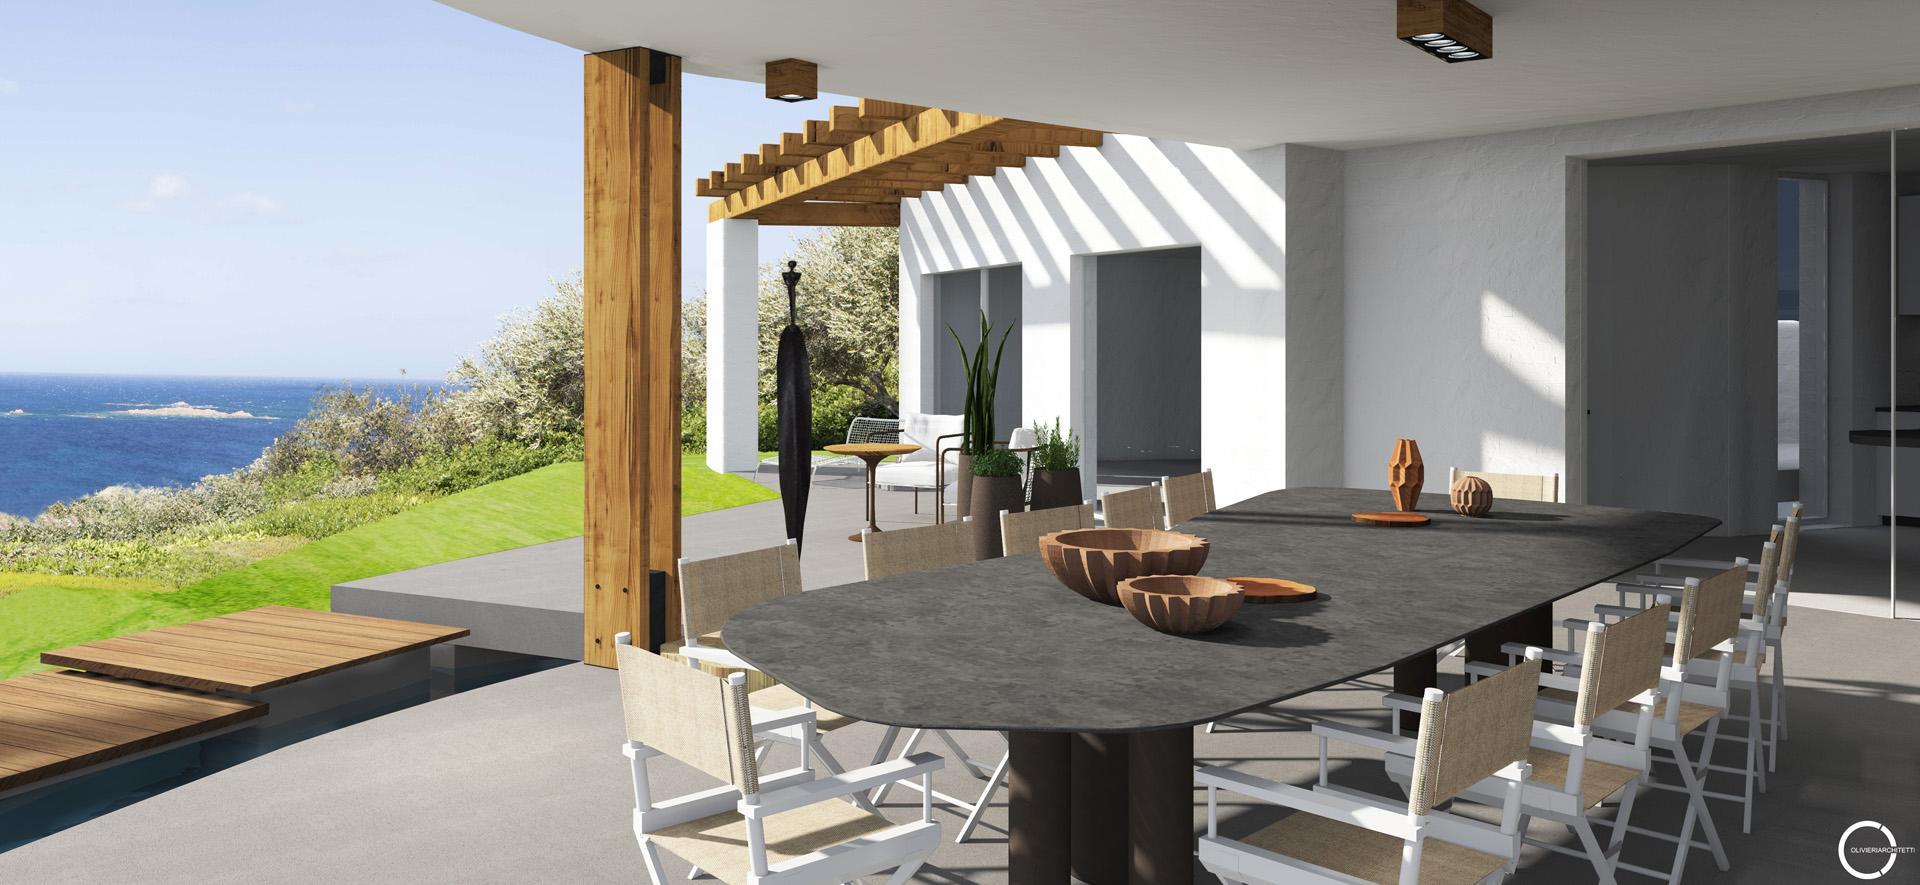 Villa Armàn luxury properties